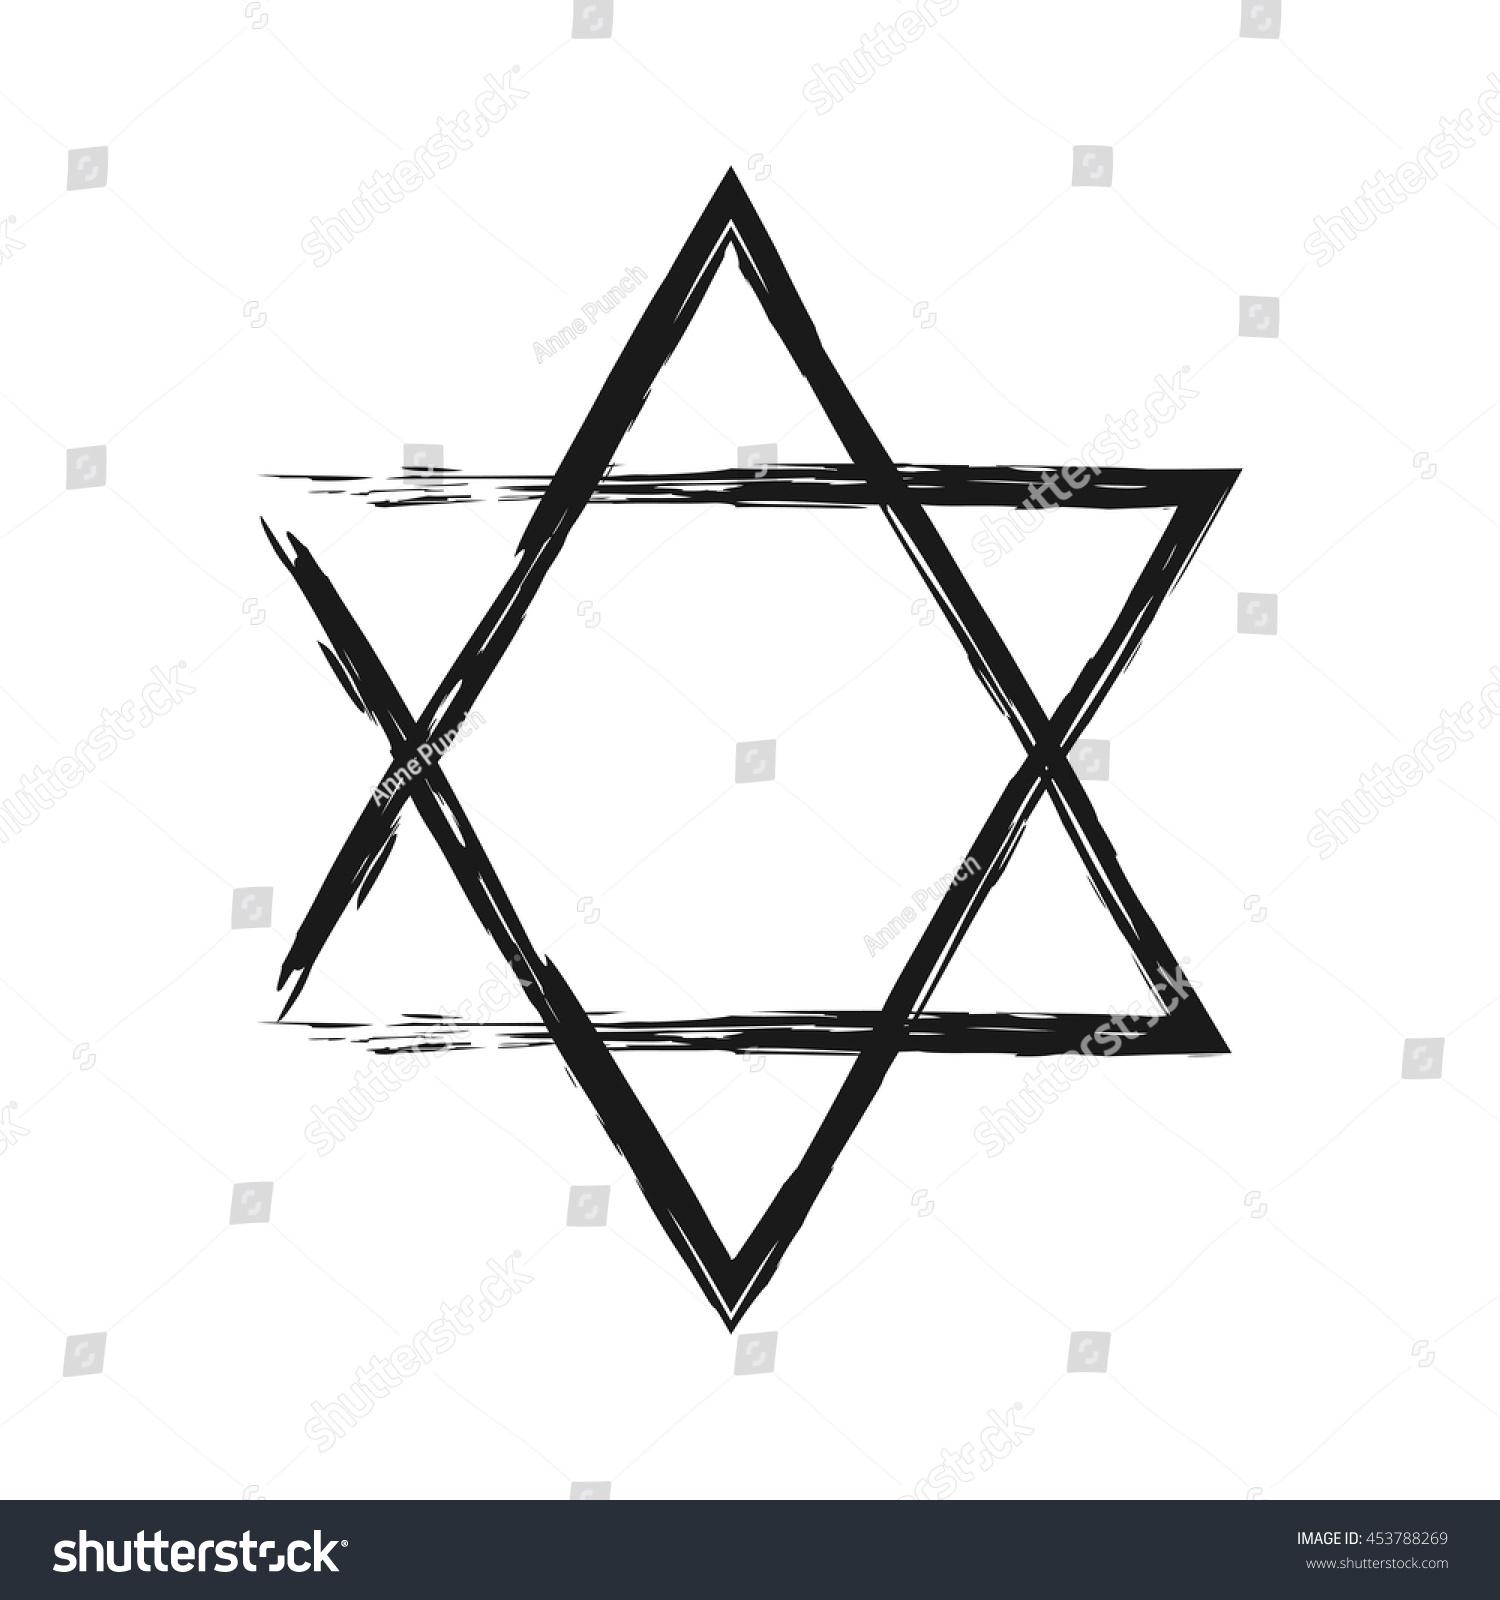 Symbol judaism star david painted broken stock vector 453788269 symbol of judaism star of david painted the broken brush isolated single element biocorpaavc